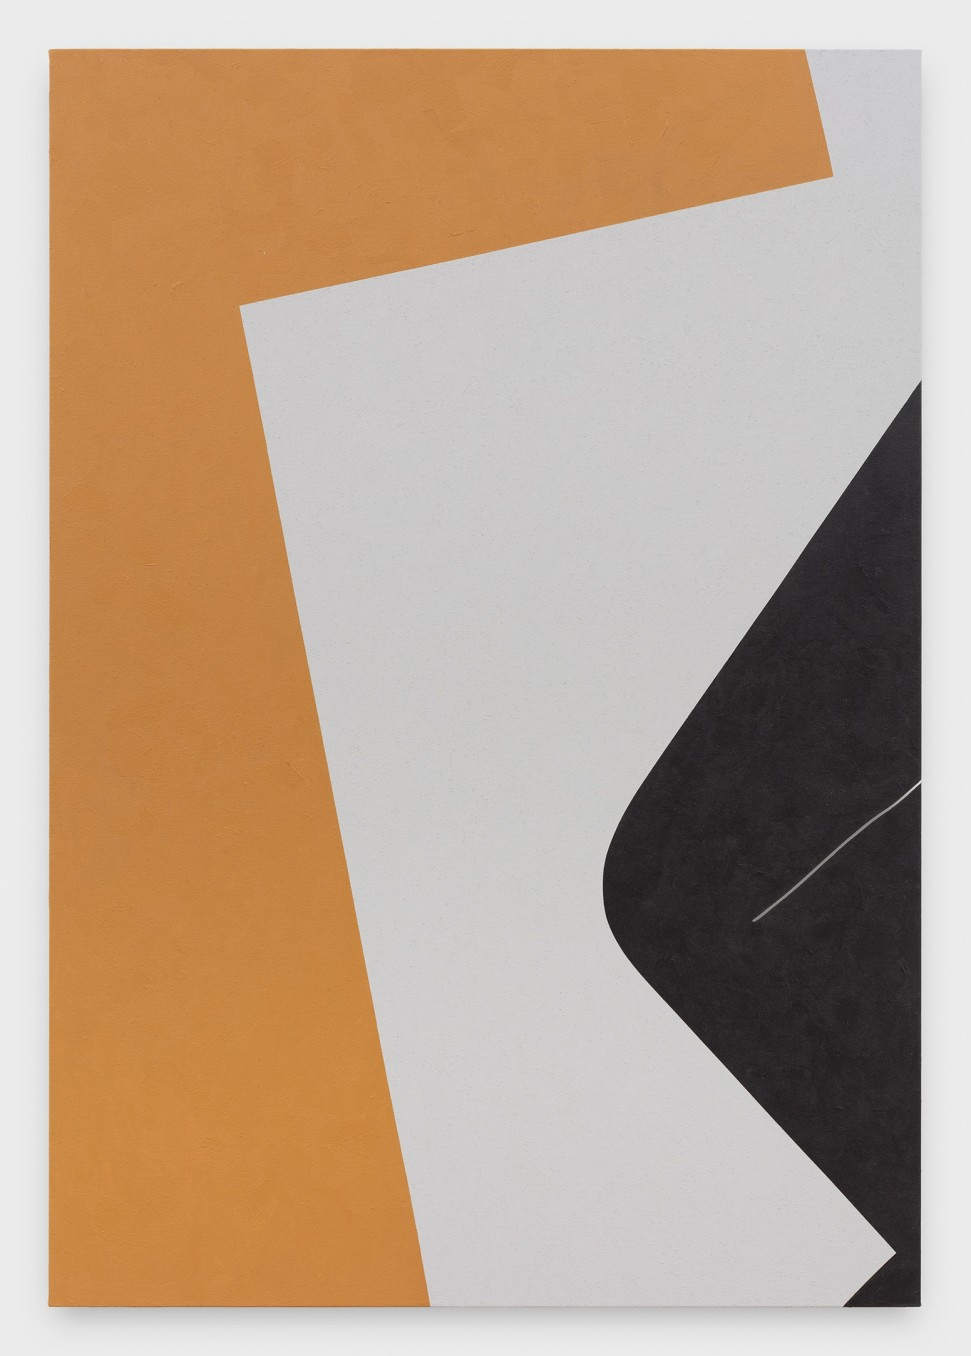 Virginia Jaramillo, Site: No. 9 37.2172° N, 38.8544° E, 2018, Acrylic on canvas, 198.1 x 137.2 cm, 78 x 54 in